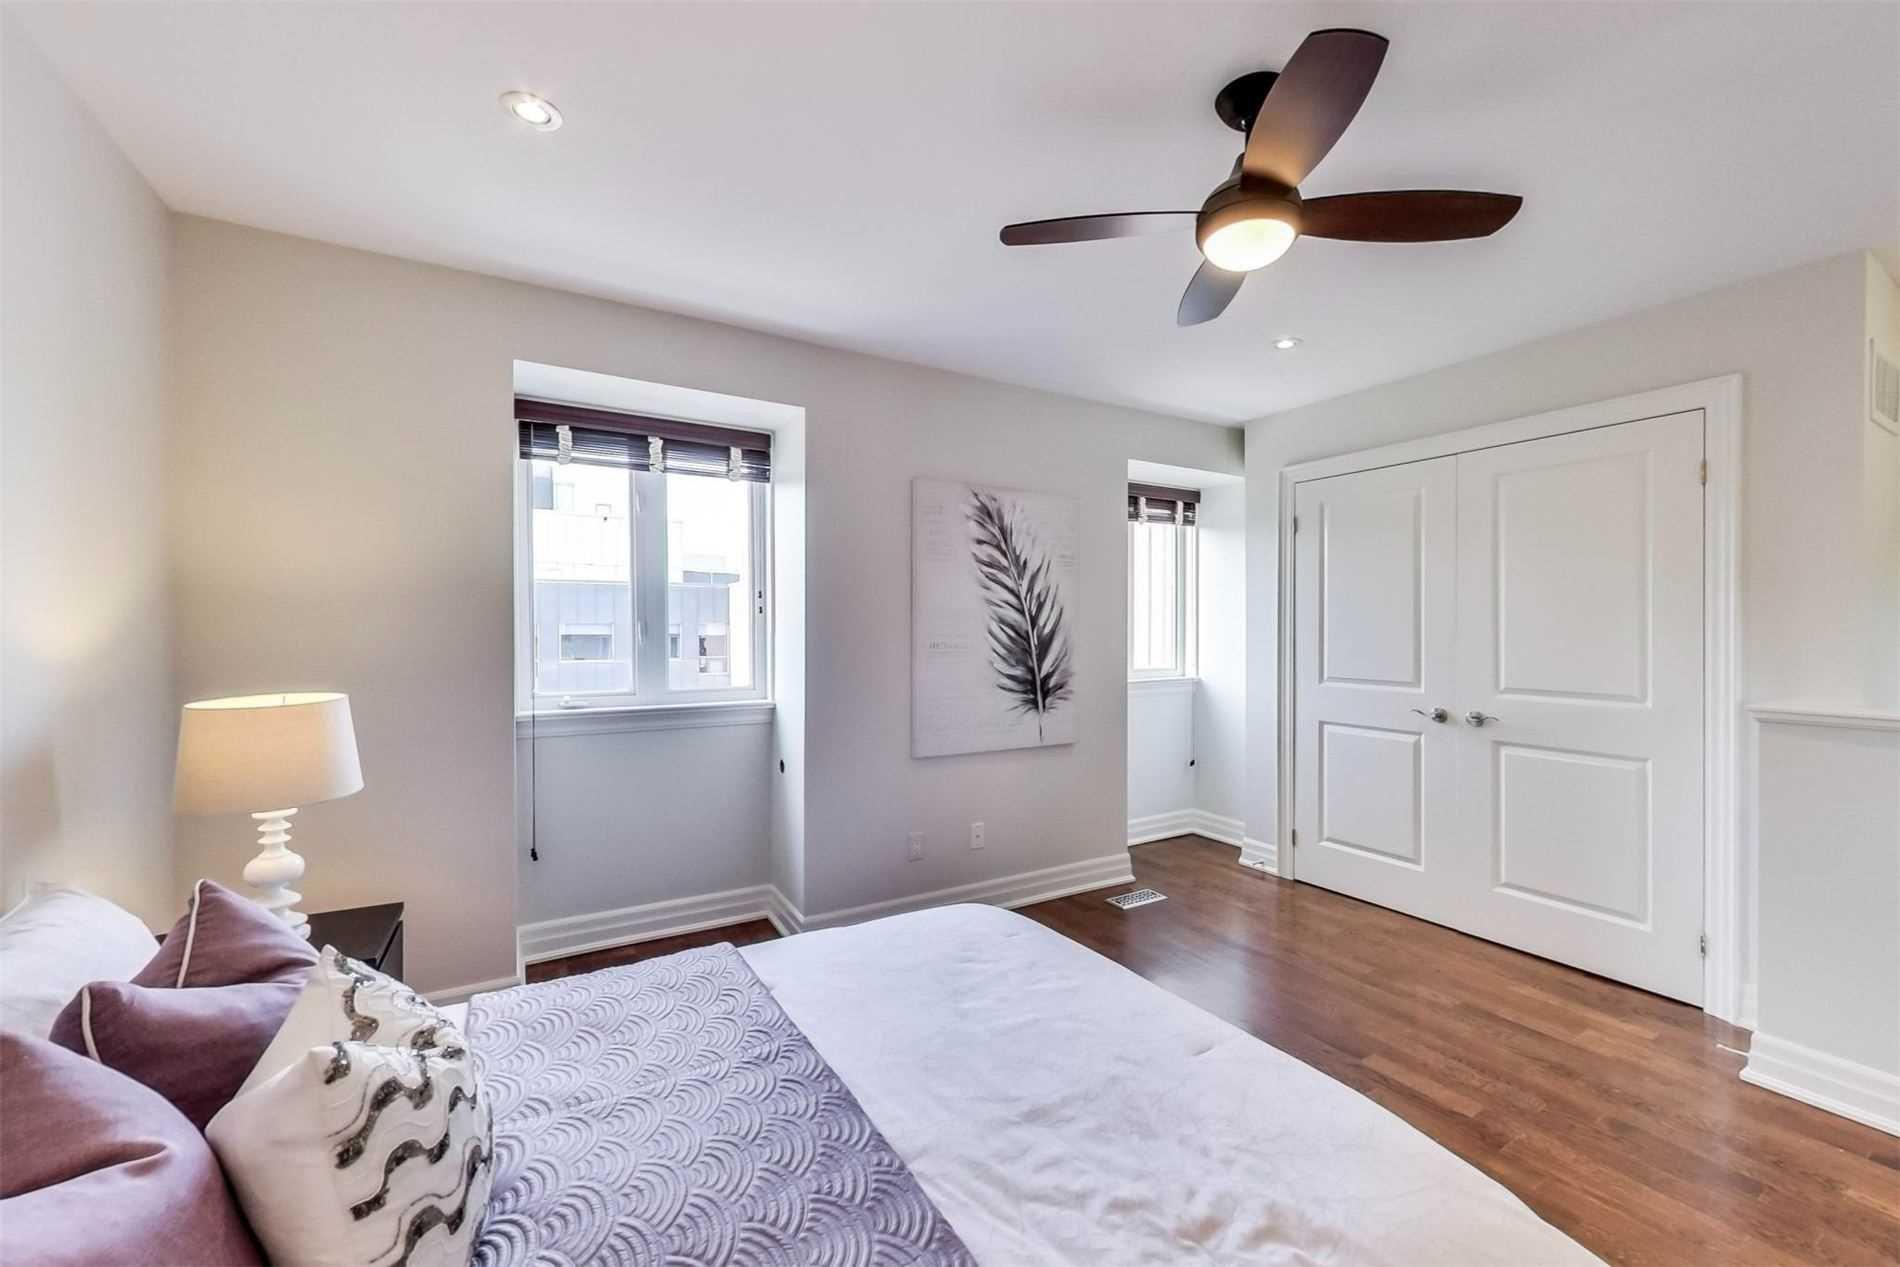 Photo 22: Photos: 213 Heward Avenue in Toronto: South Riverdale House (3-Storey) for sale (Toronto E01)  : MLS®# E4941877